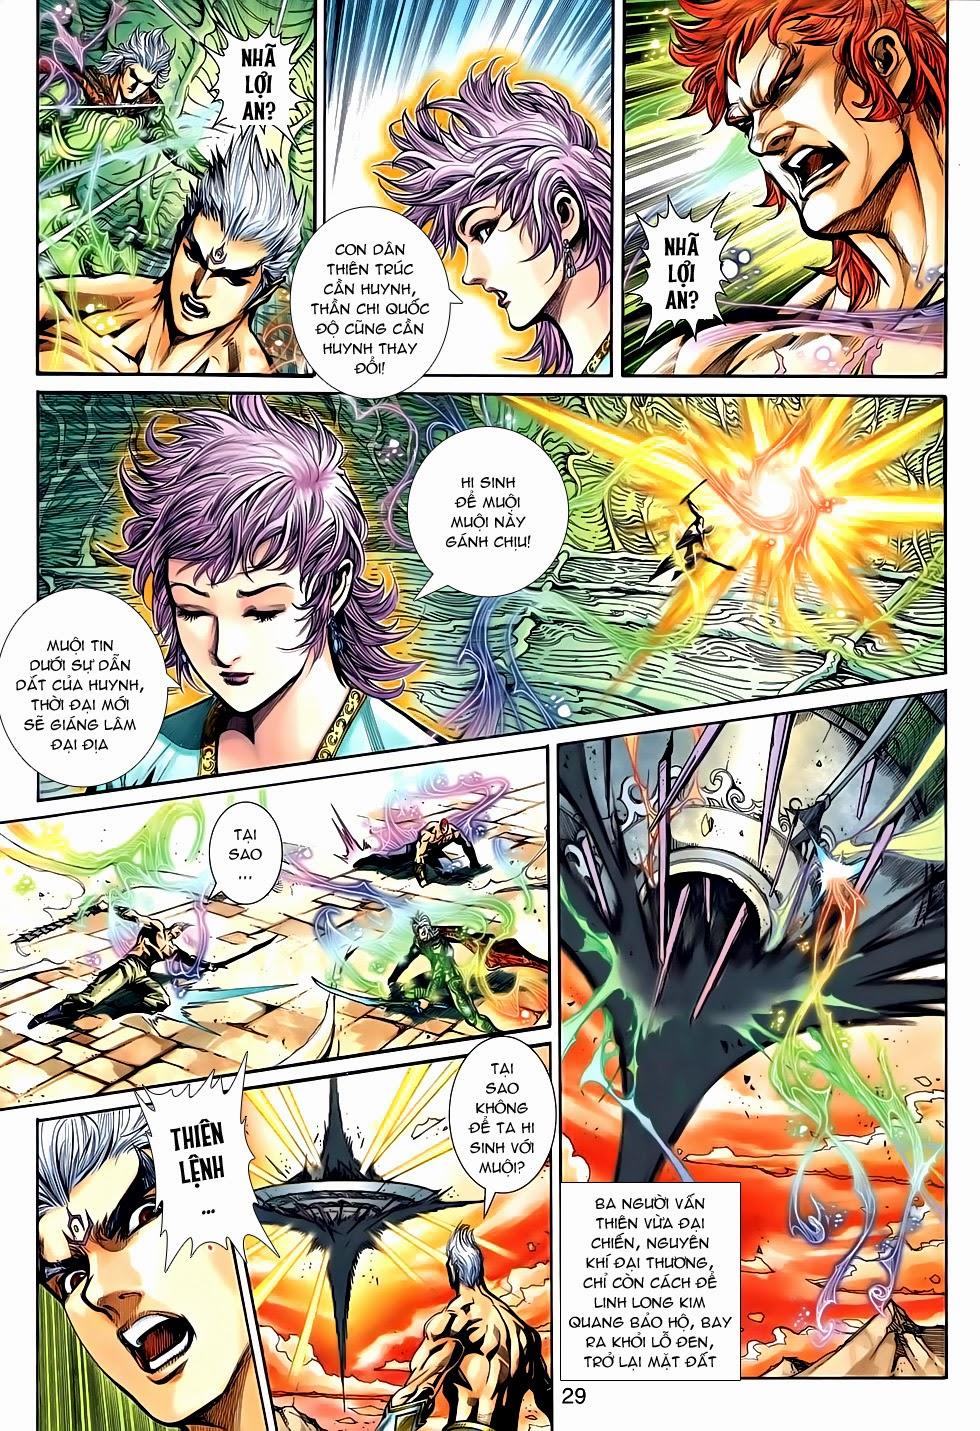 Thần Binh Tiền Truyện 2 Chapter 24 - Hamtruyen.vn